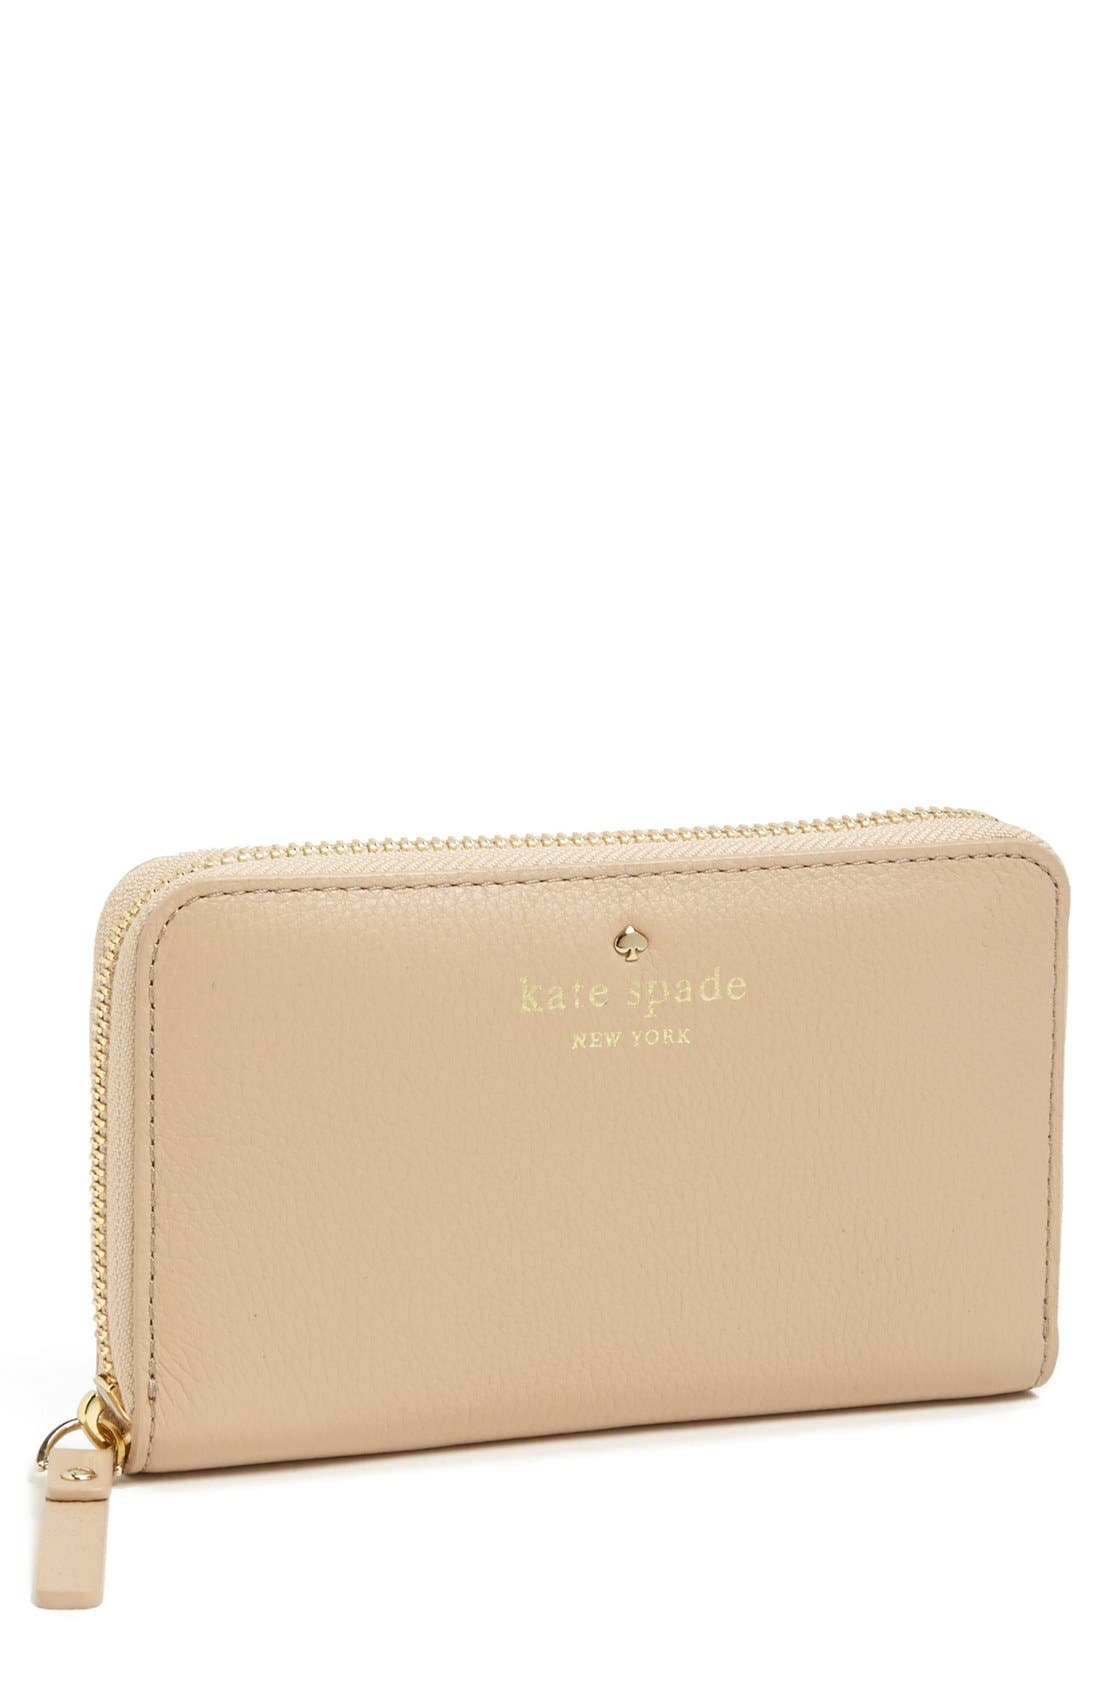 Main Image - kate spade new york 'lacey - small' zip wallet